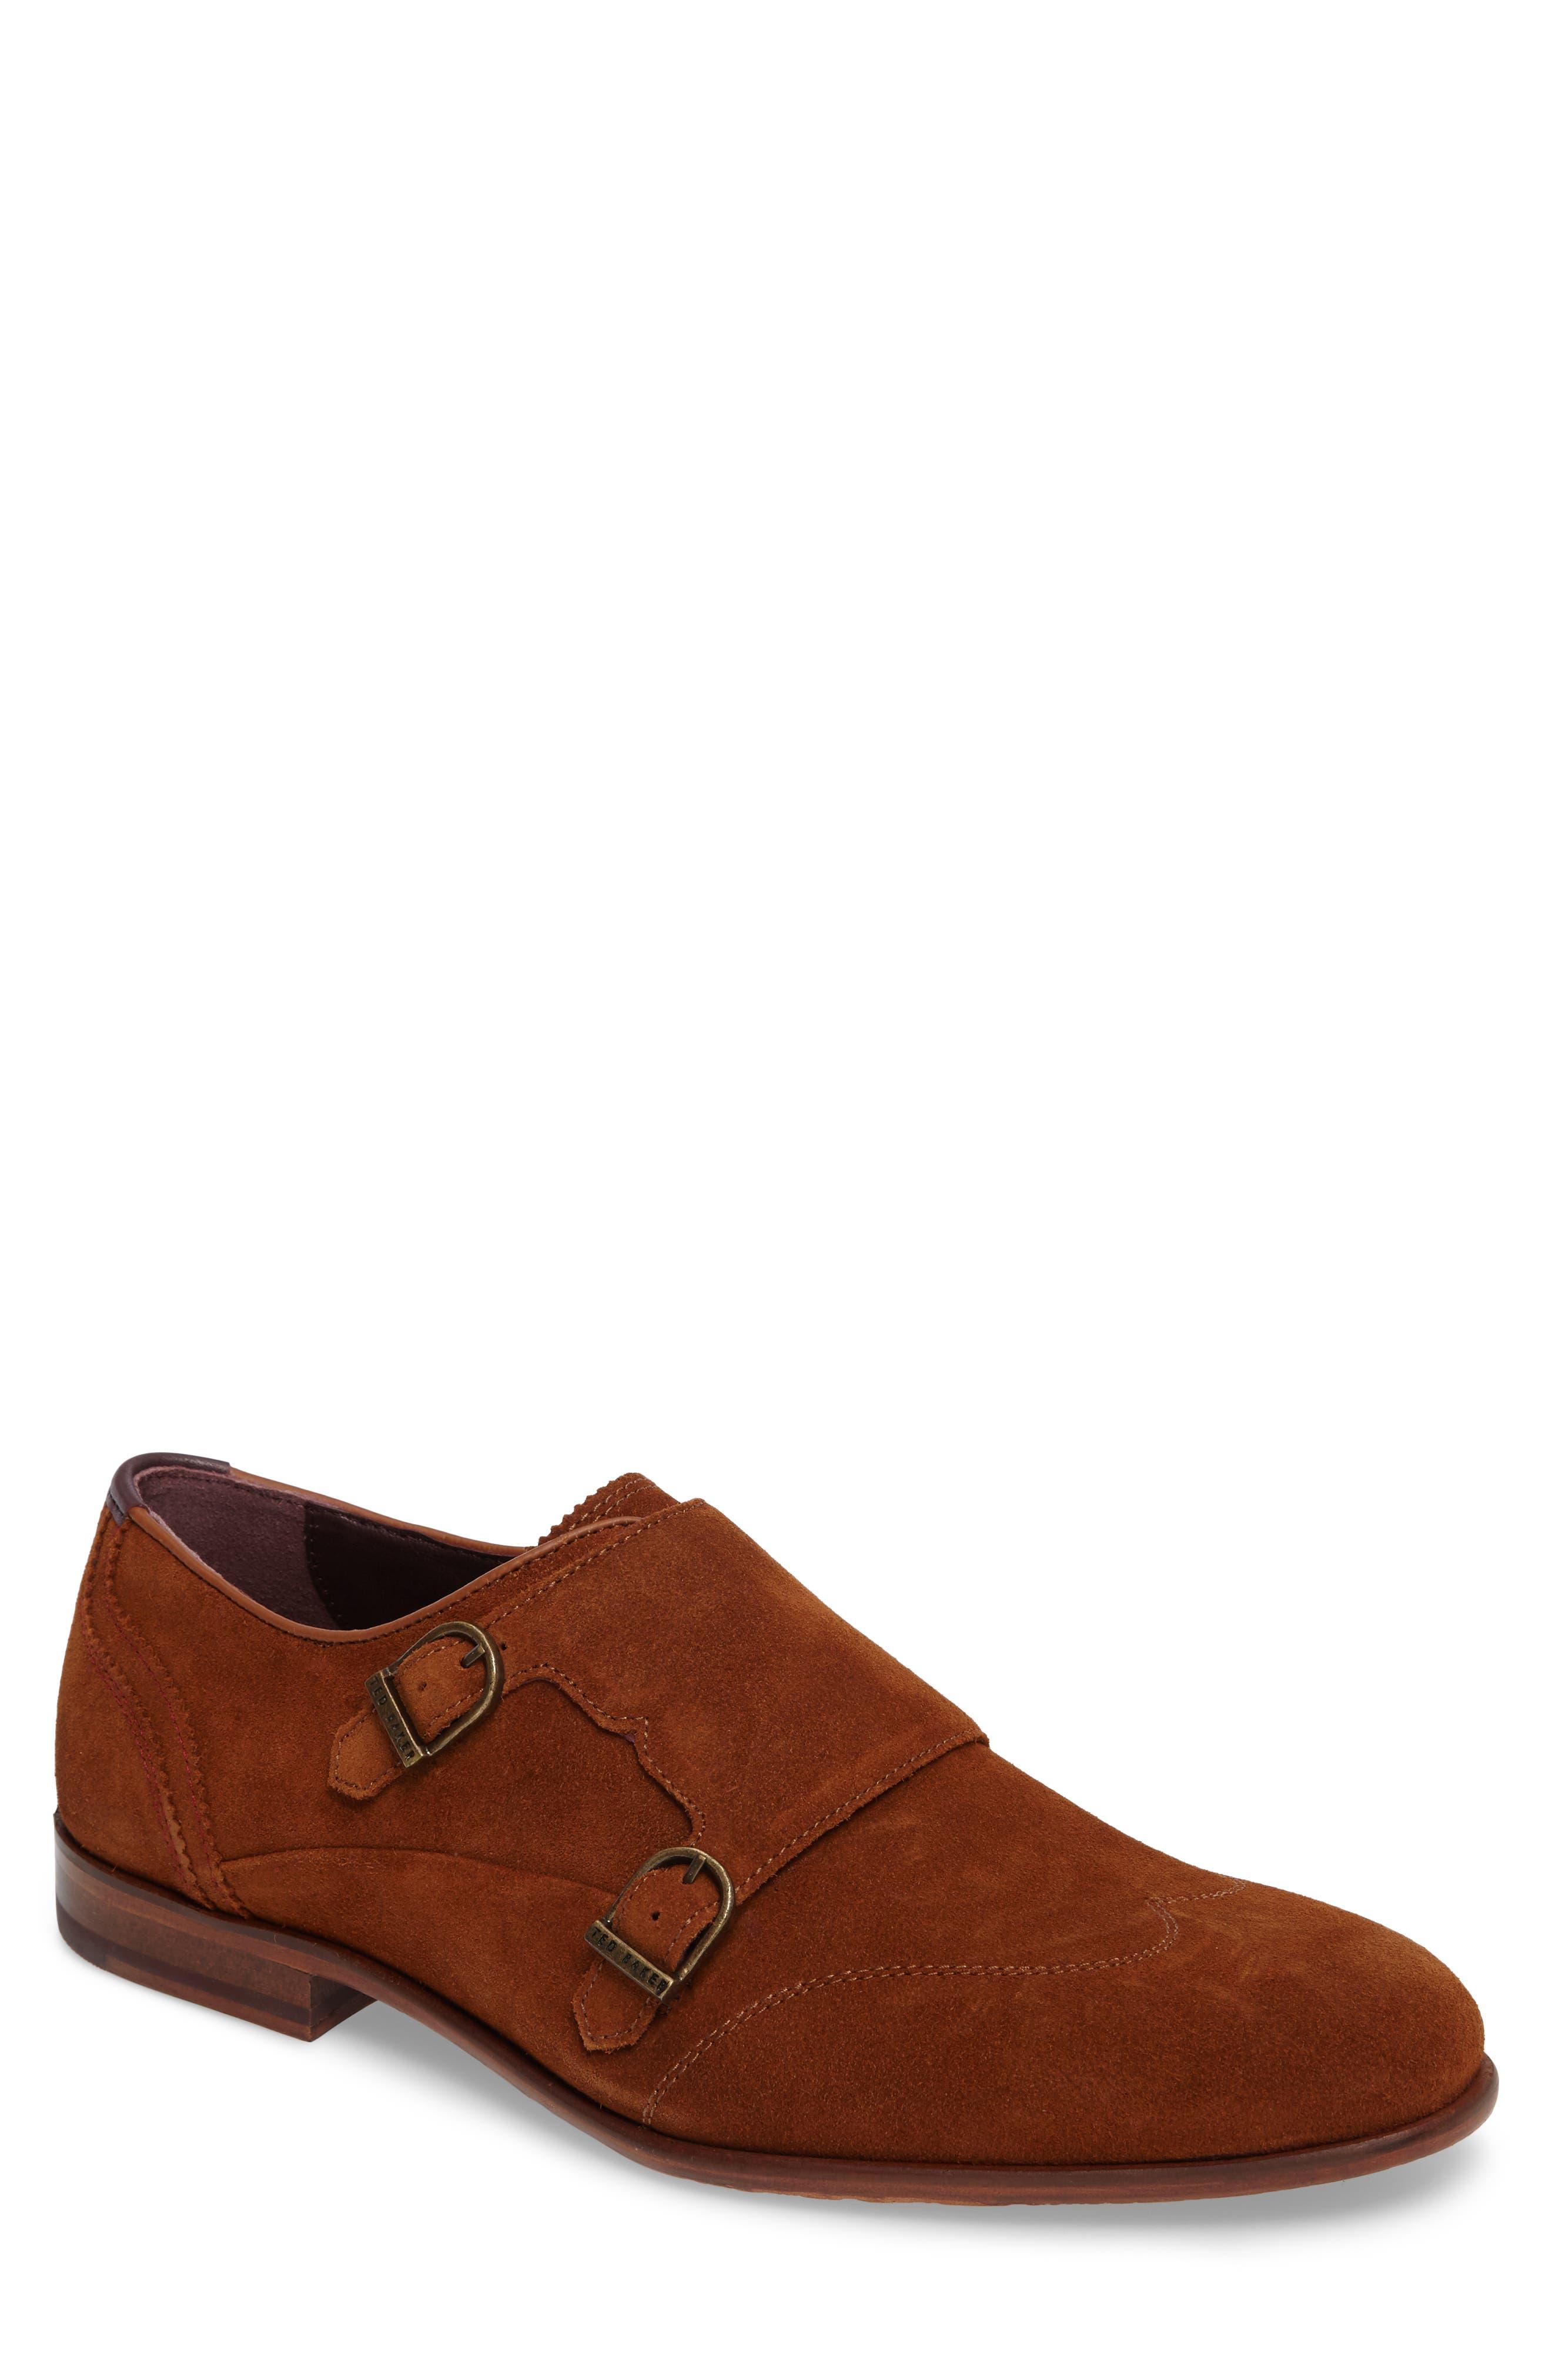 Main Image - Ted Baker London Rovere Wingtip Monk Shoe (Men)